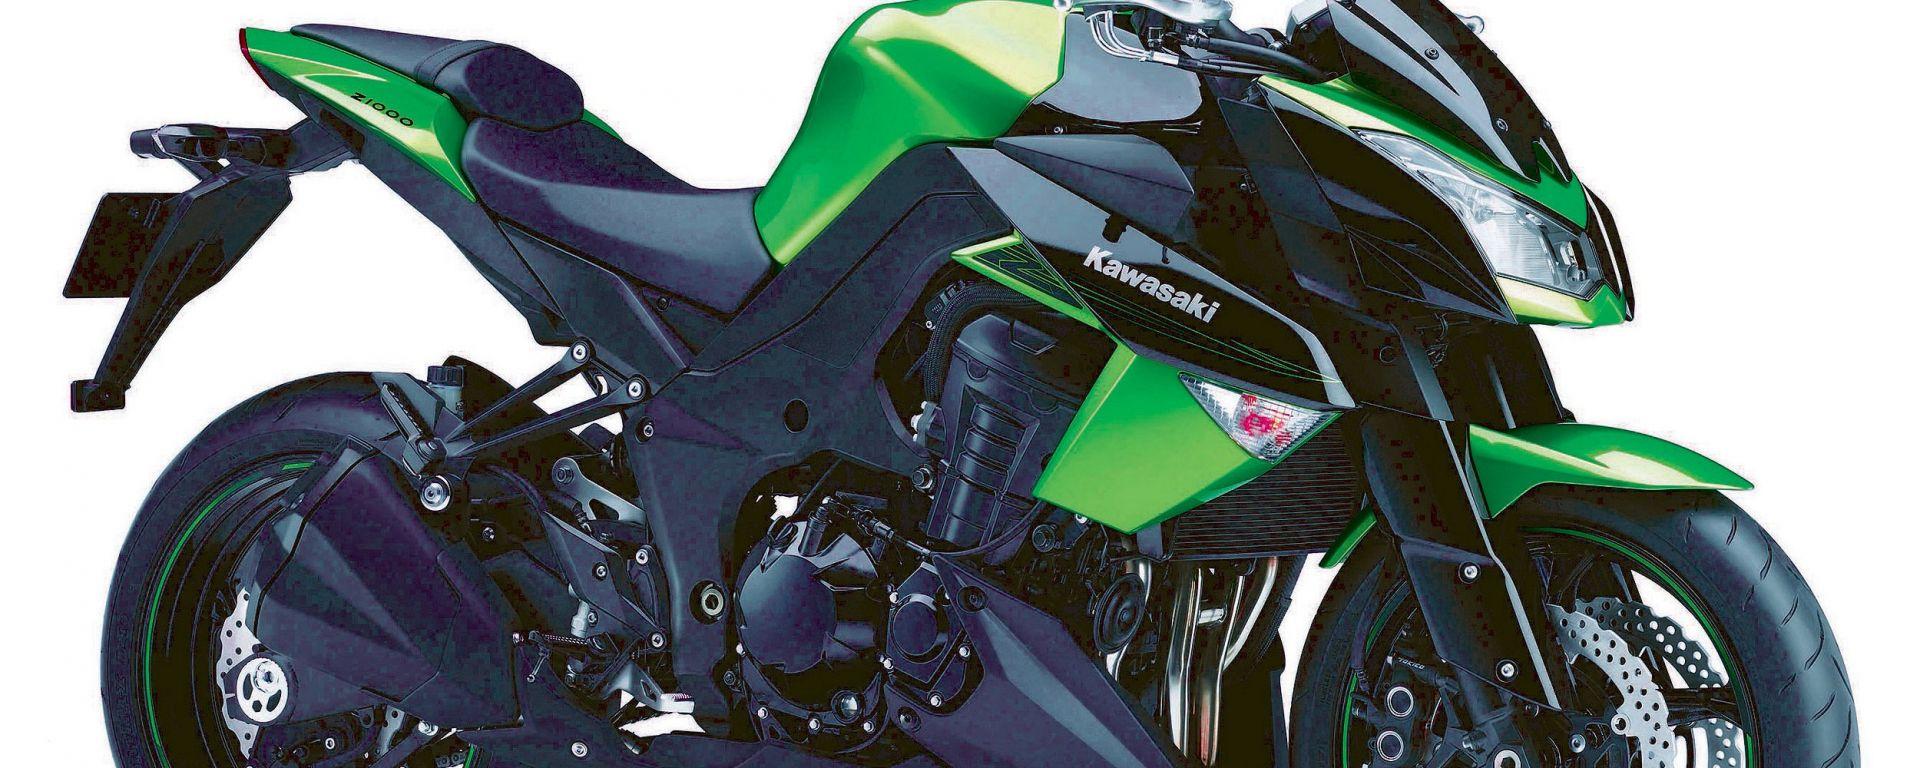 Kawasaki nuovi colori 2011